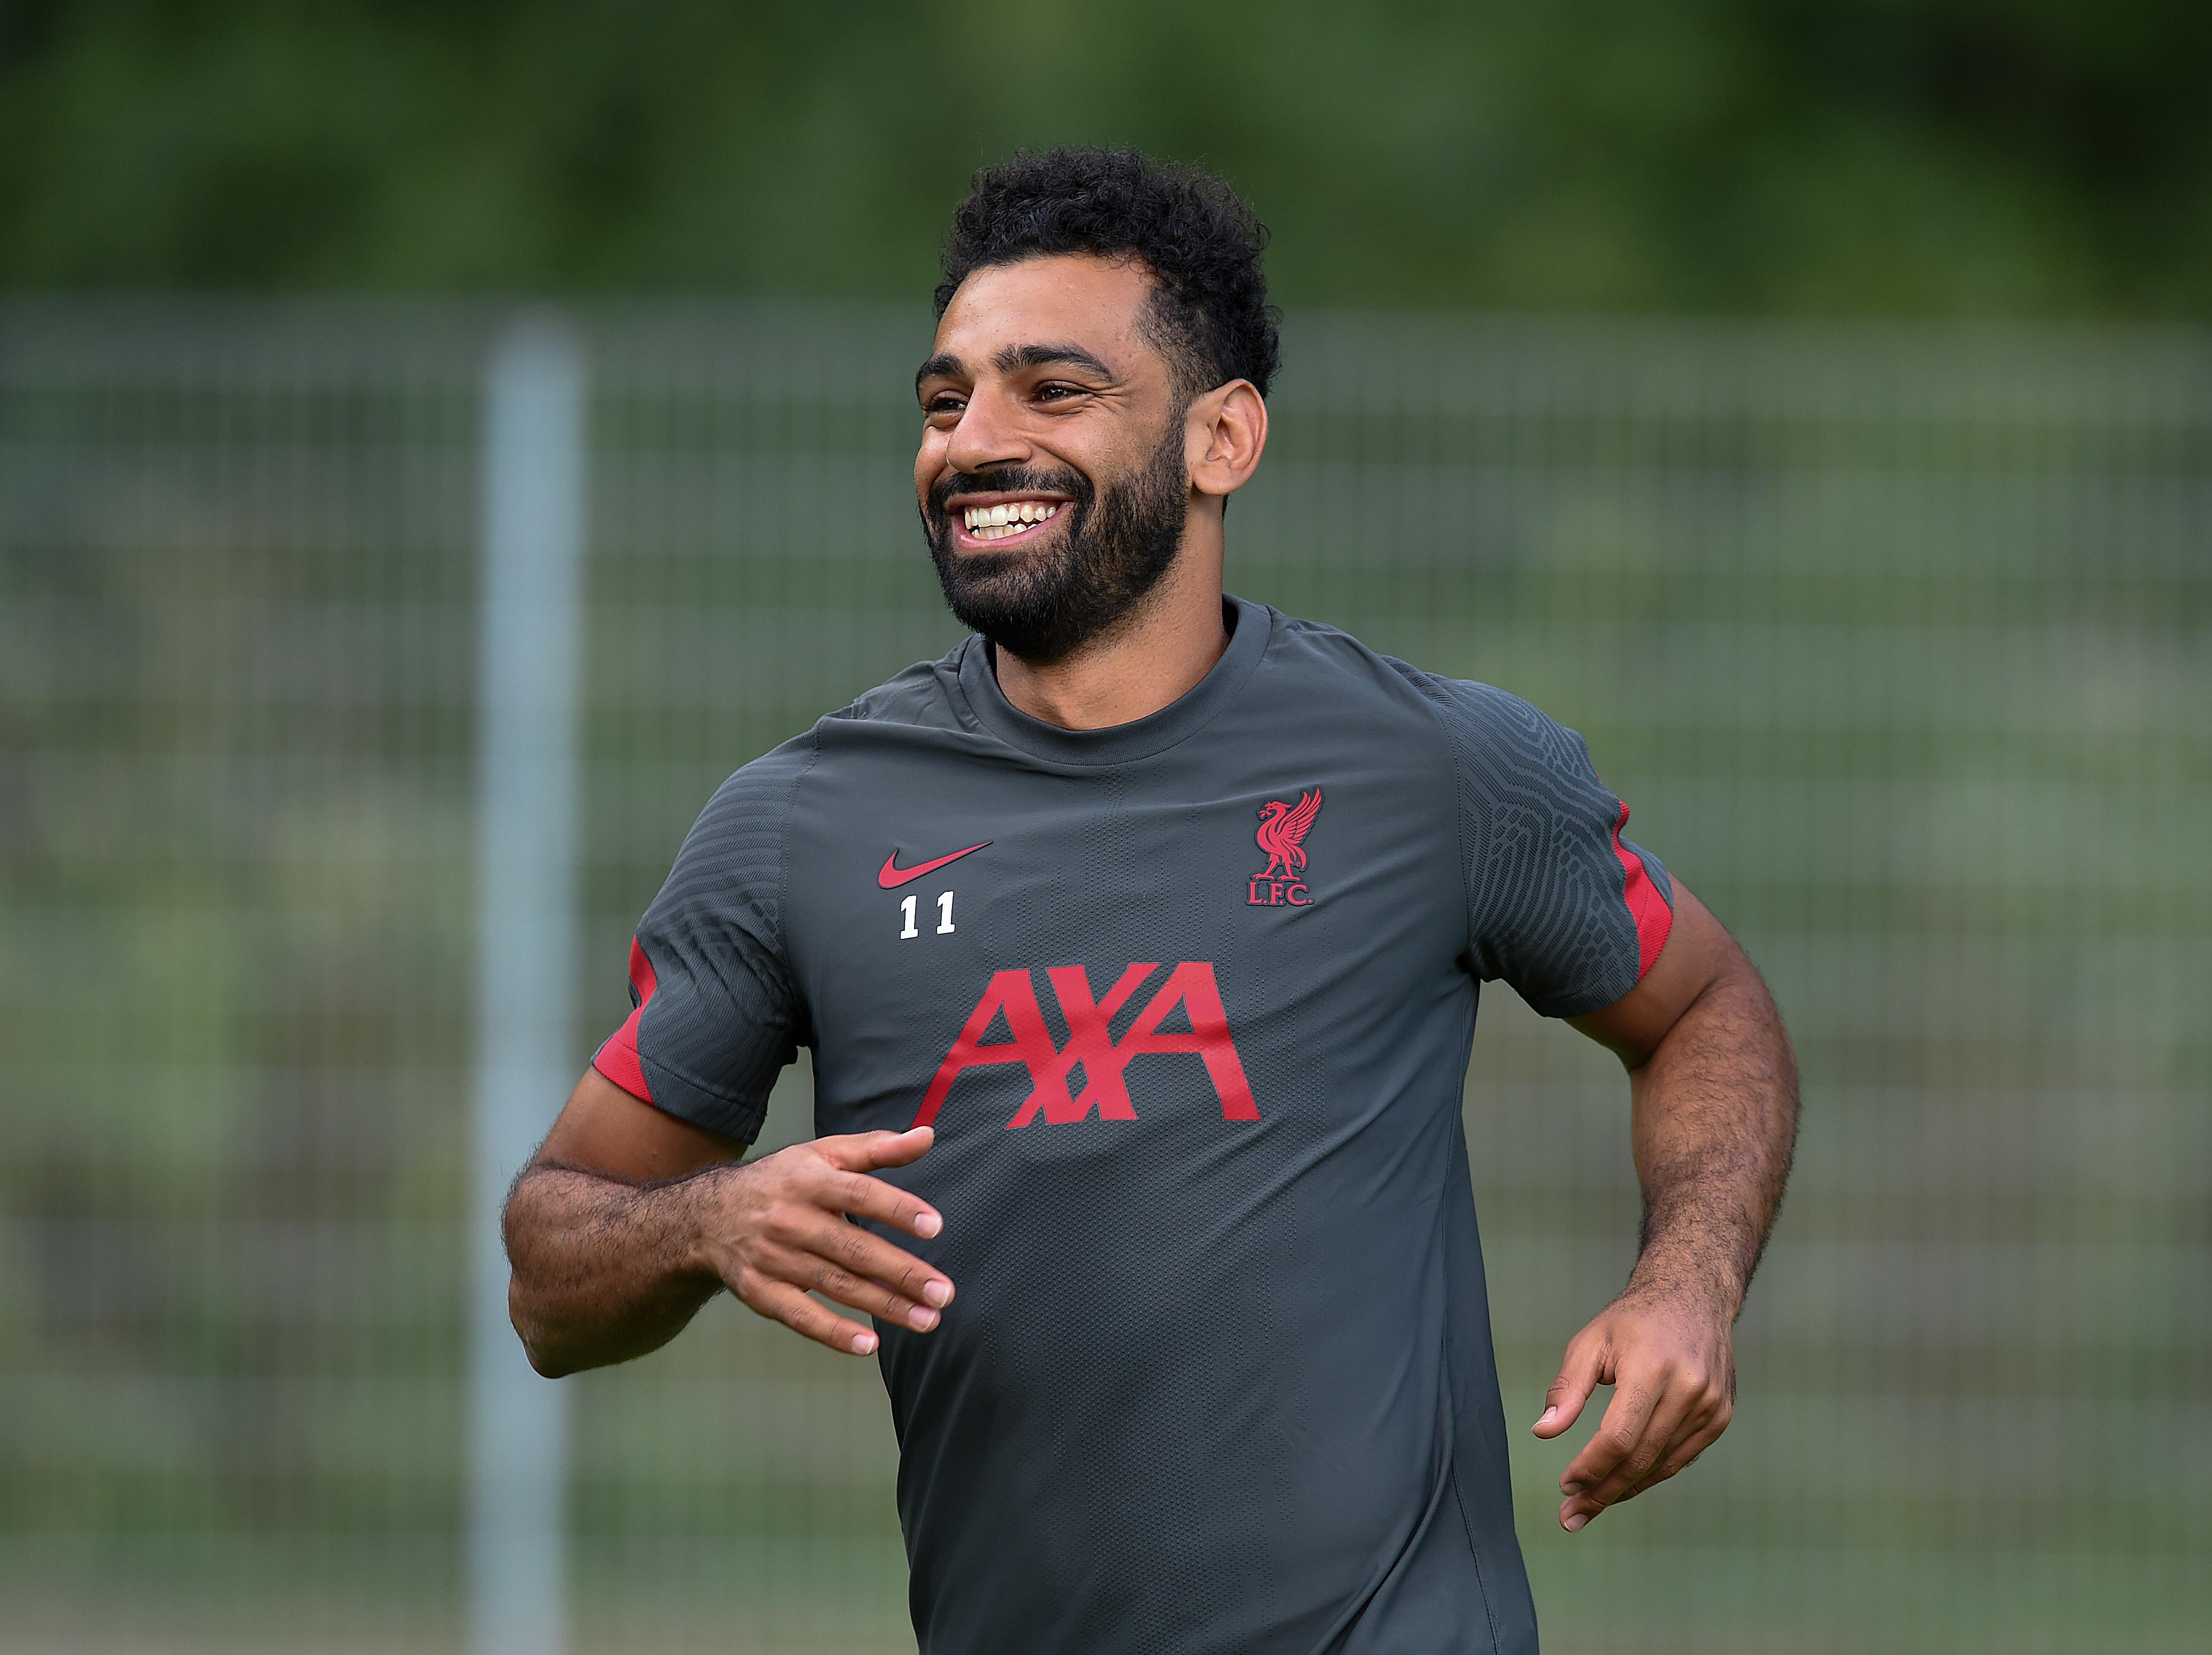 Mohamed Salah - Liverpool Pre-Season Training Session - Premier League